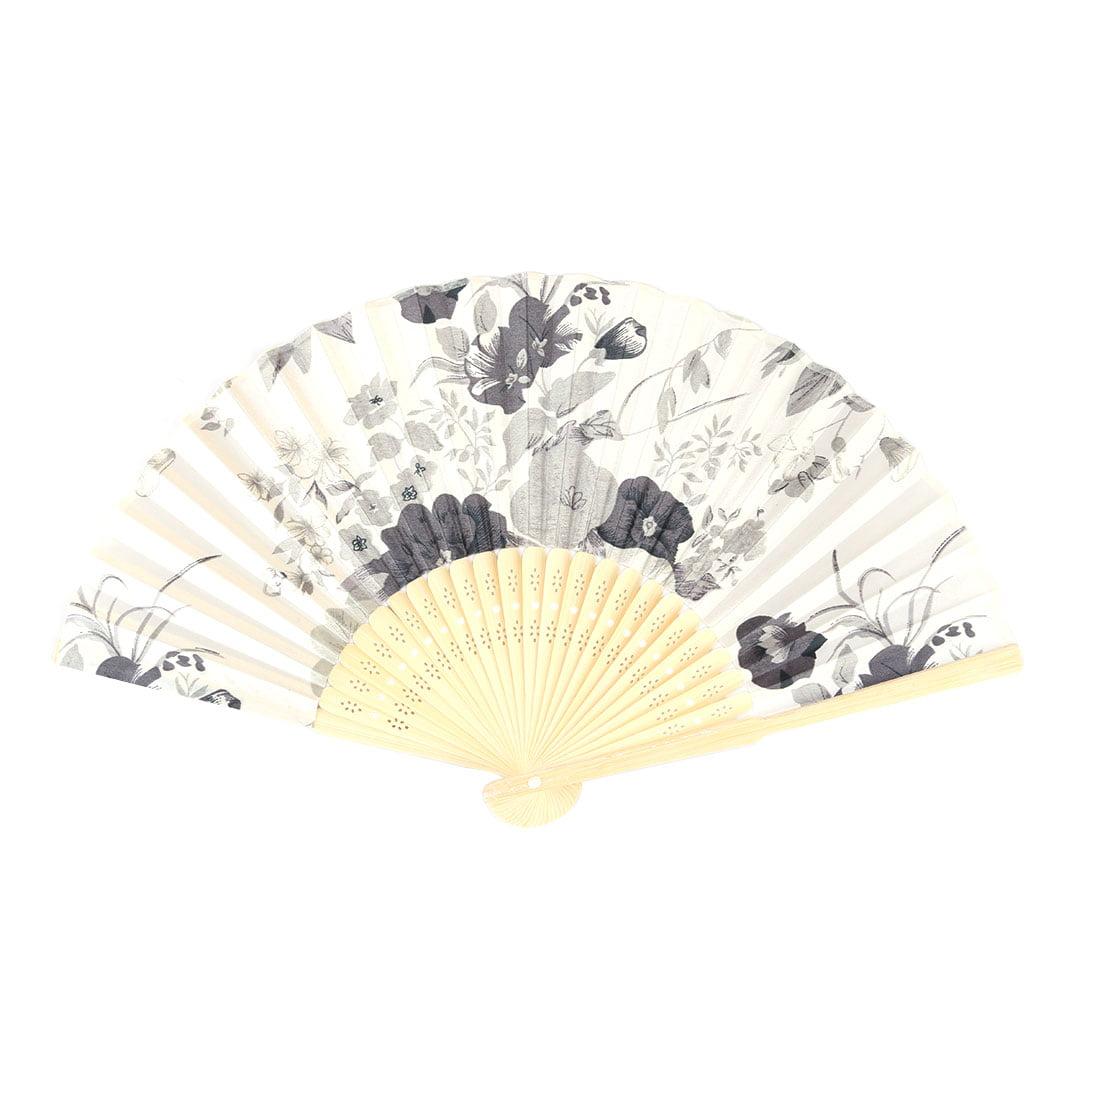 Wedding Bamboo Frame Flower Pattern Decorative Folding Dancing Hand Fan Gray - image 4 de 4